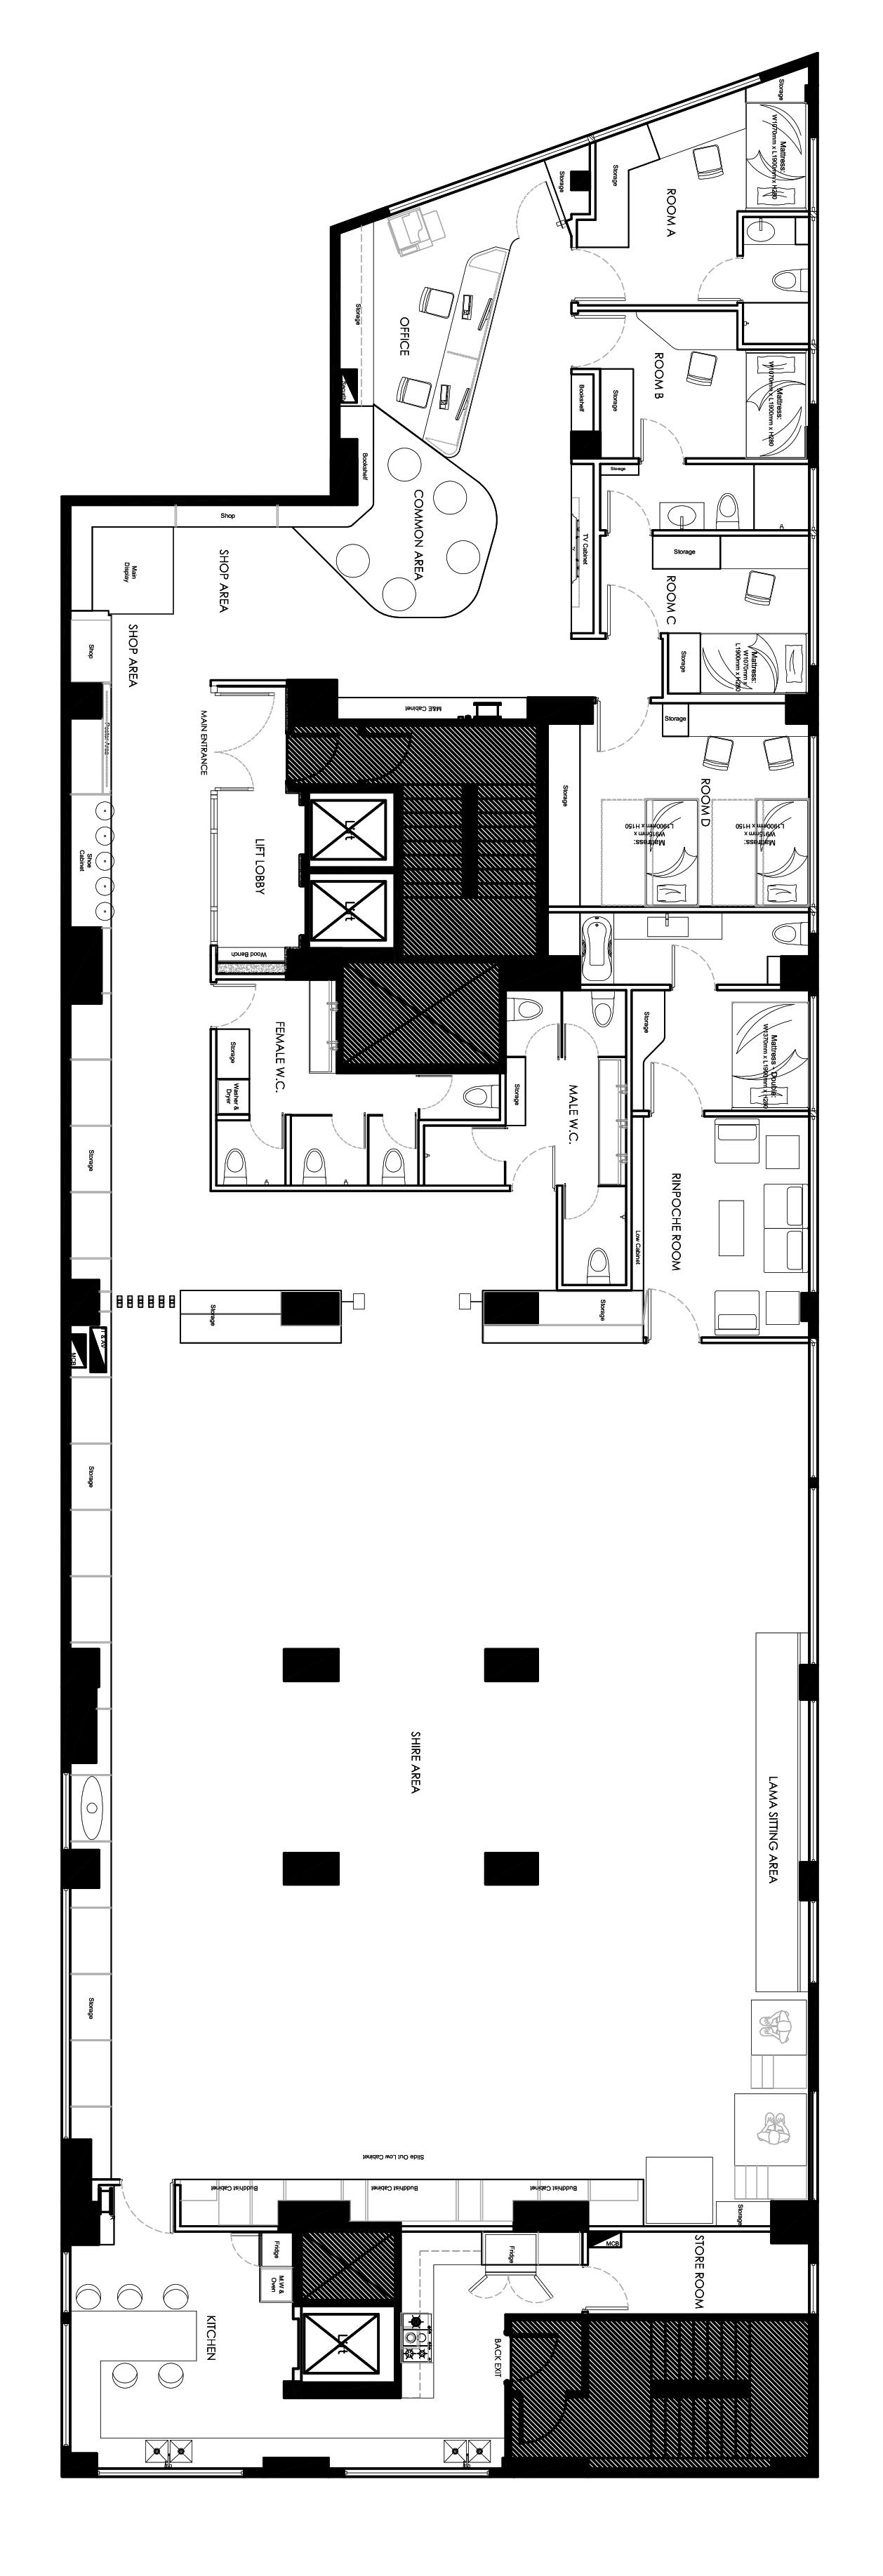 佛教中心設計Buddhist Center Design Karma Kagyu HK  (10)